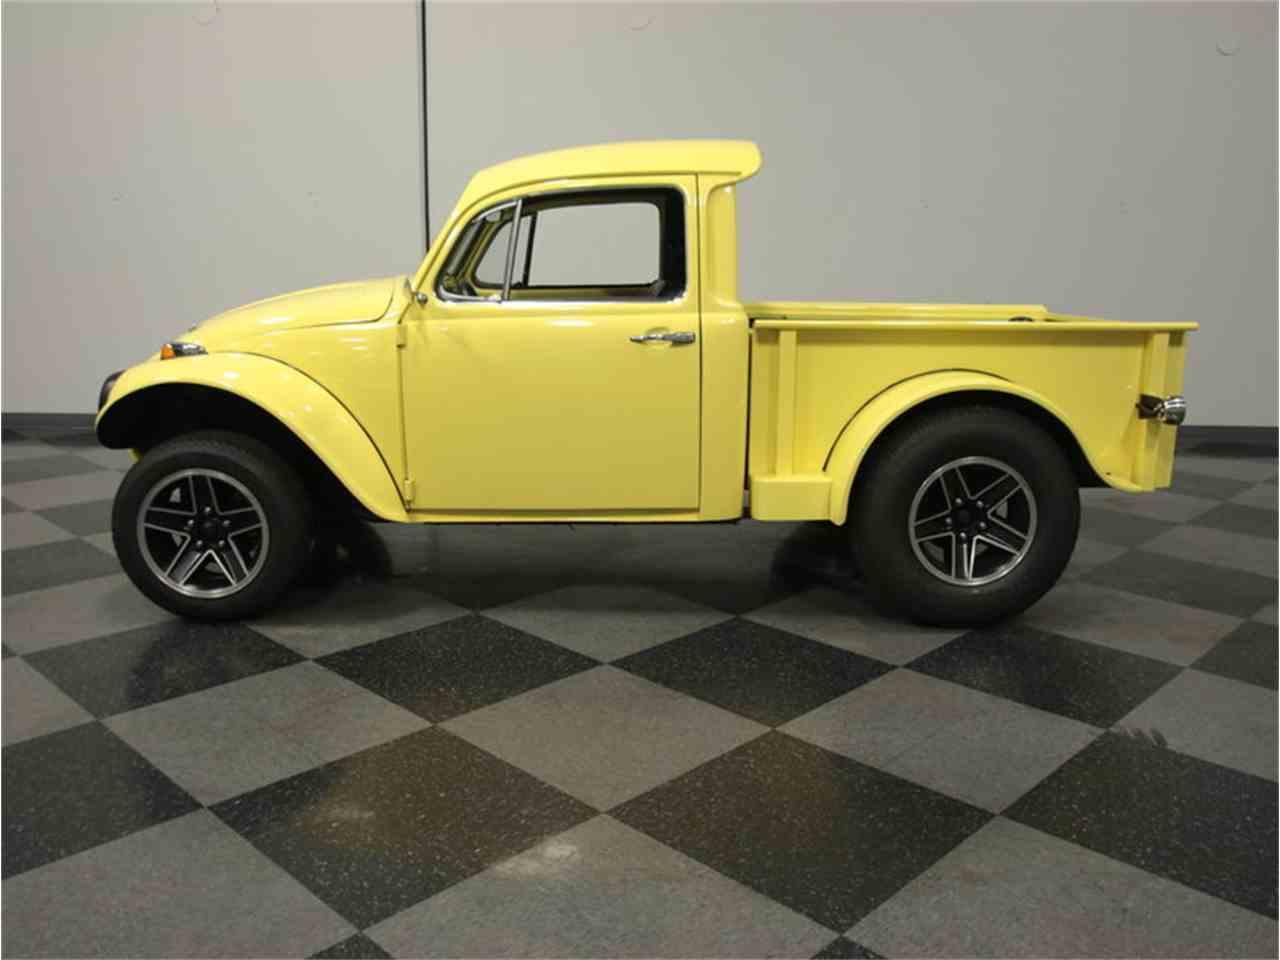 1970 Volkswagen Baja Beetle Truck for Sale | ClassicCars.com | CC ...